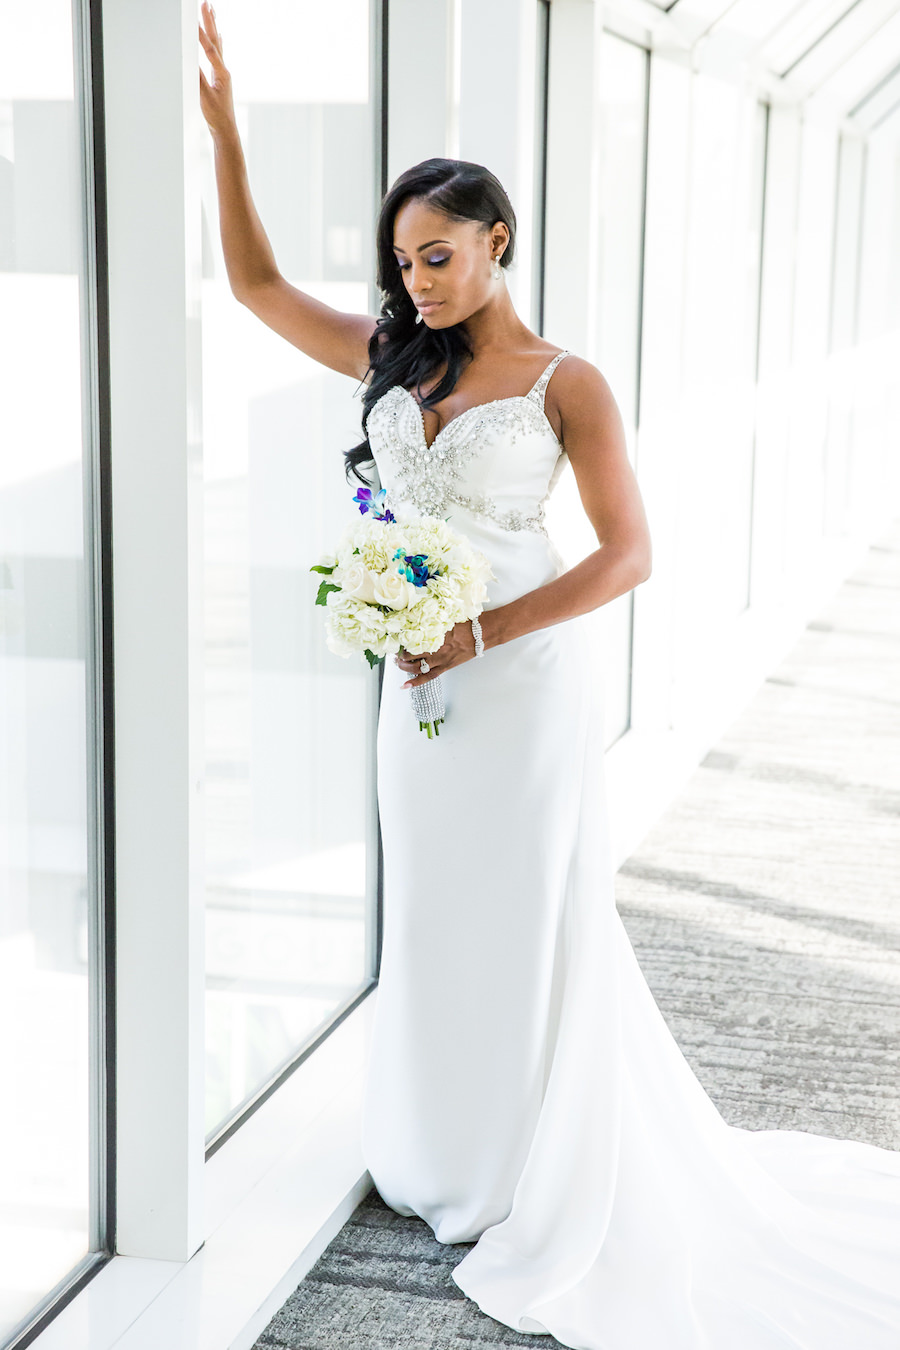 Bridal Portrait Wearing White Beaded Demetrios Bride Wedding Dress   White Wedding Bouquet